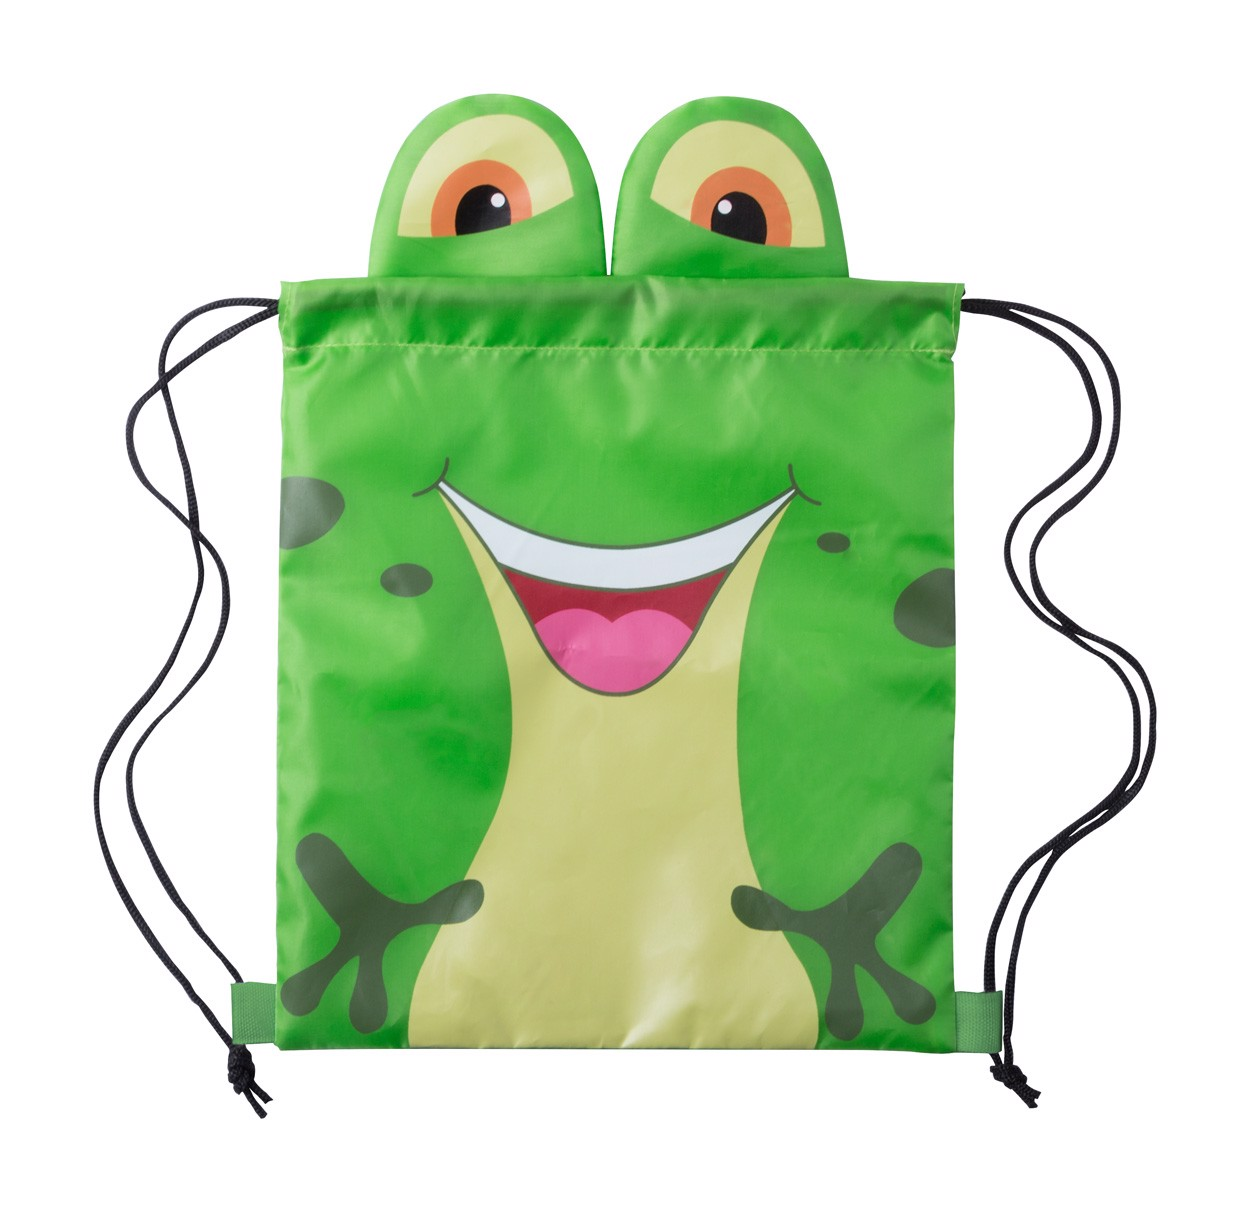 Drawstring Bag Llorel - Green